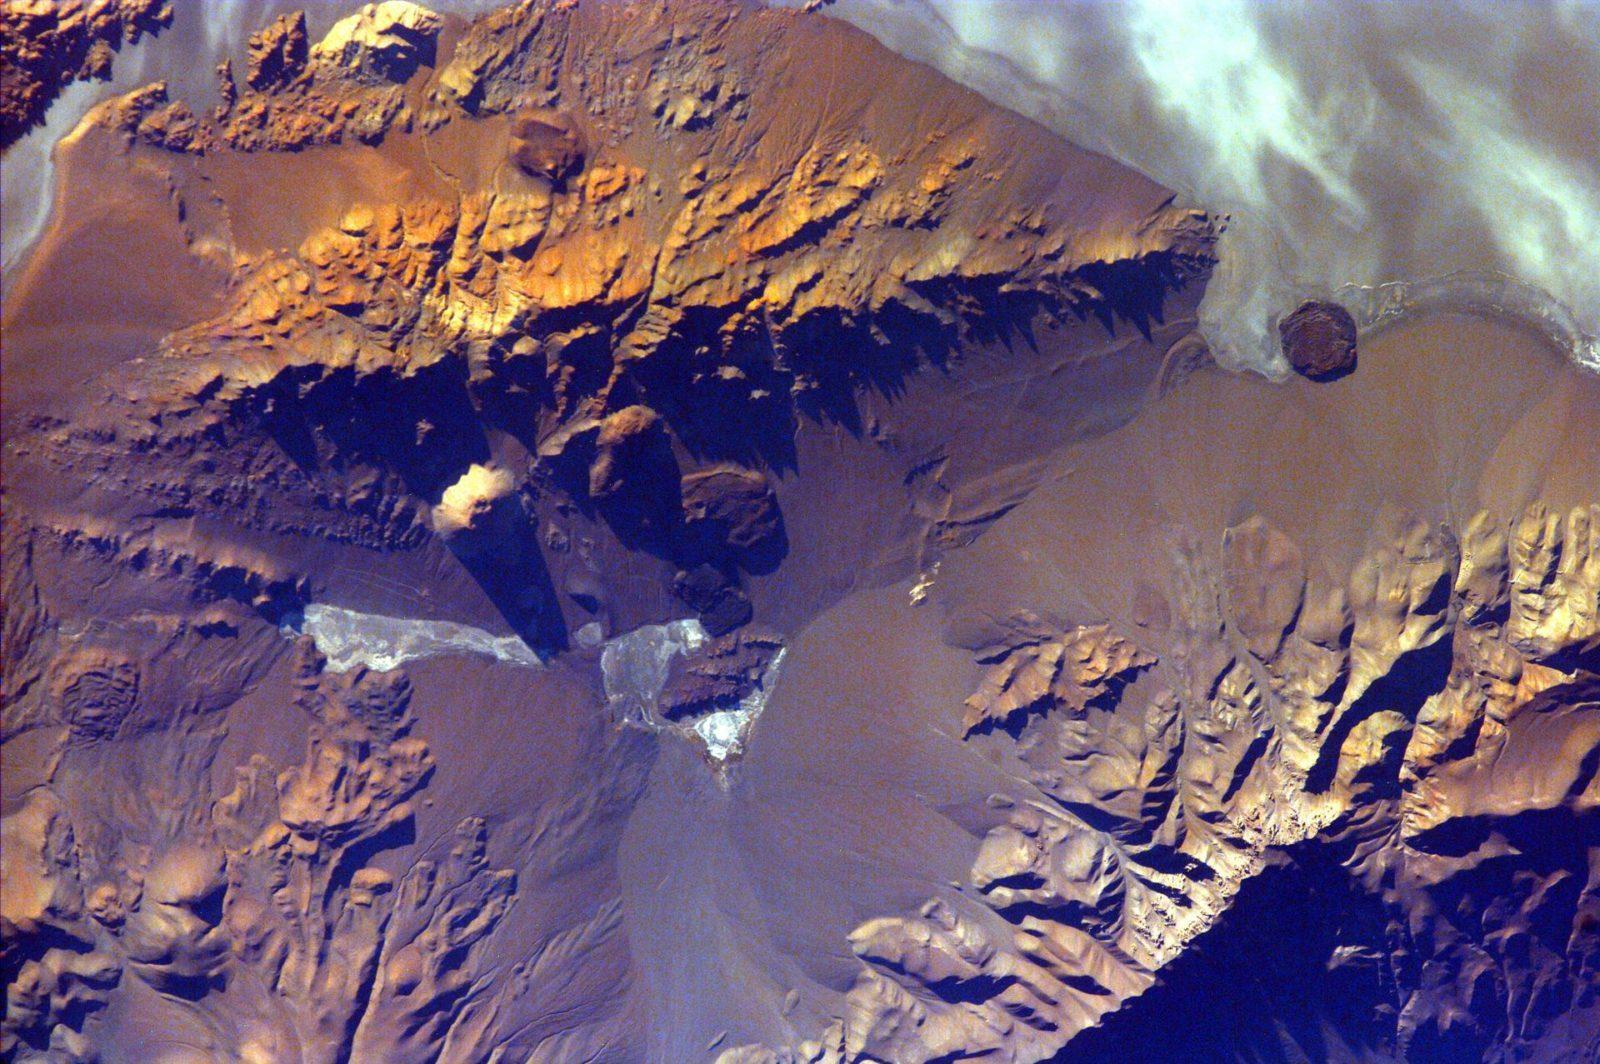 Aracar Volcano, Andes Mountains, Argentina near Chile Border